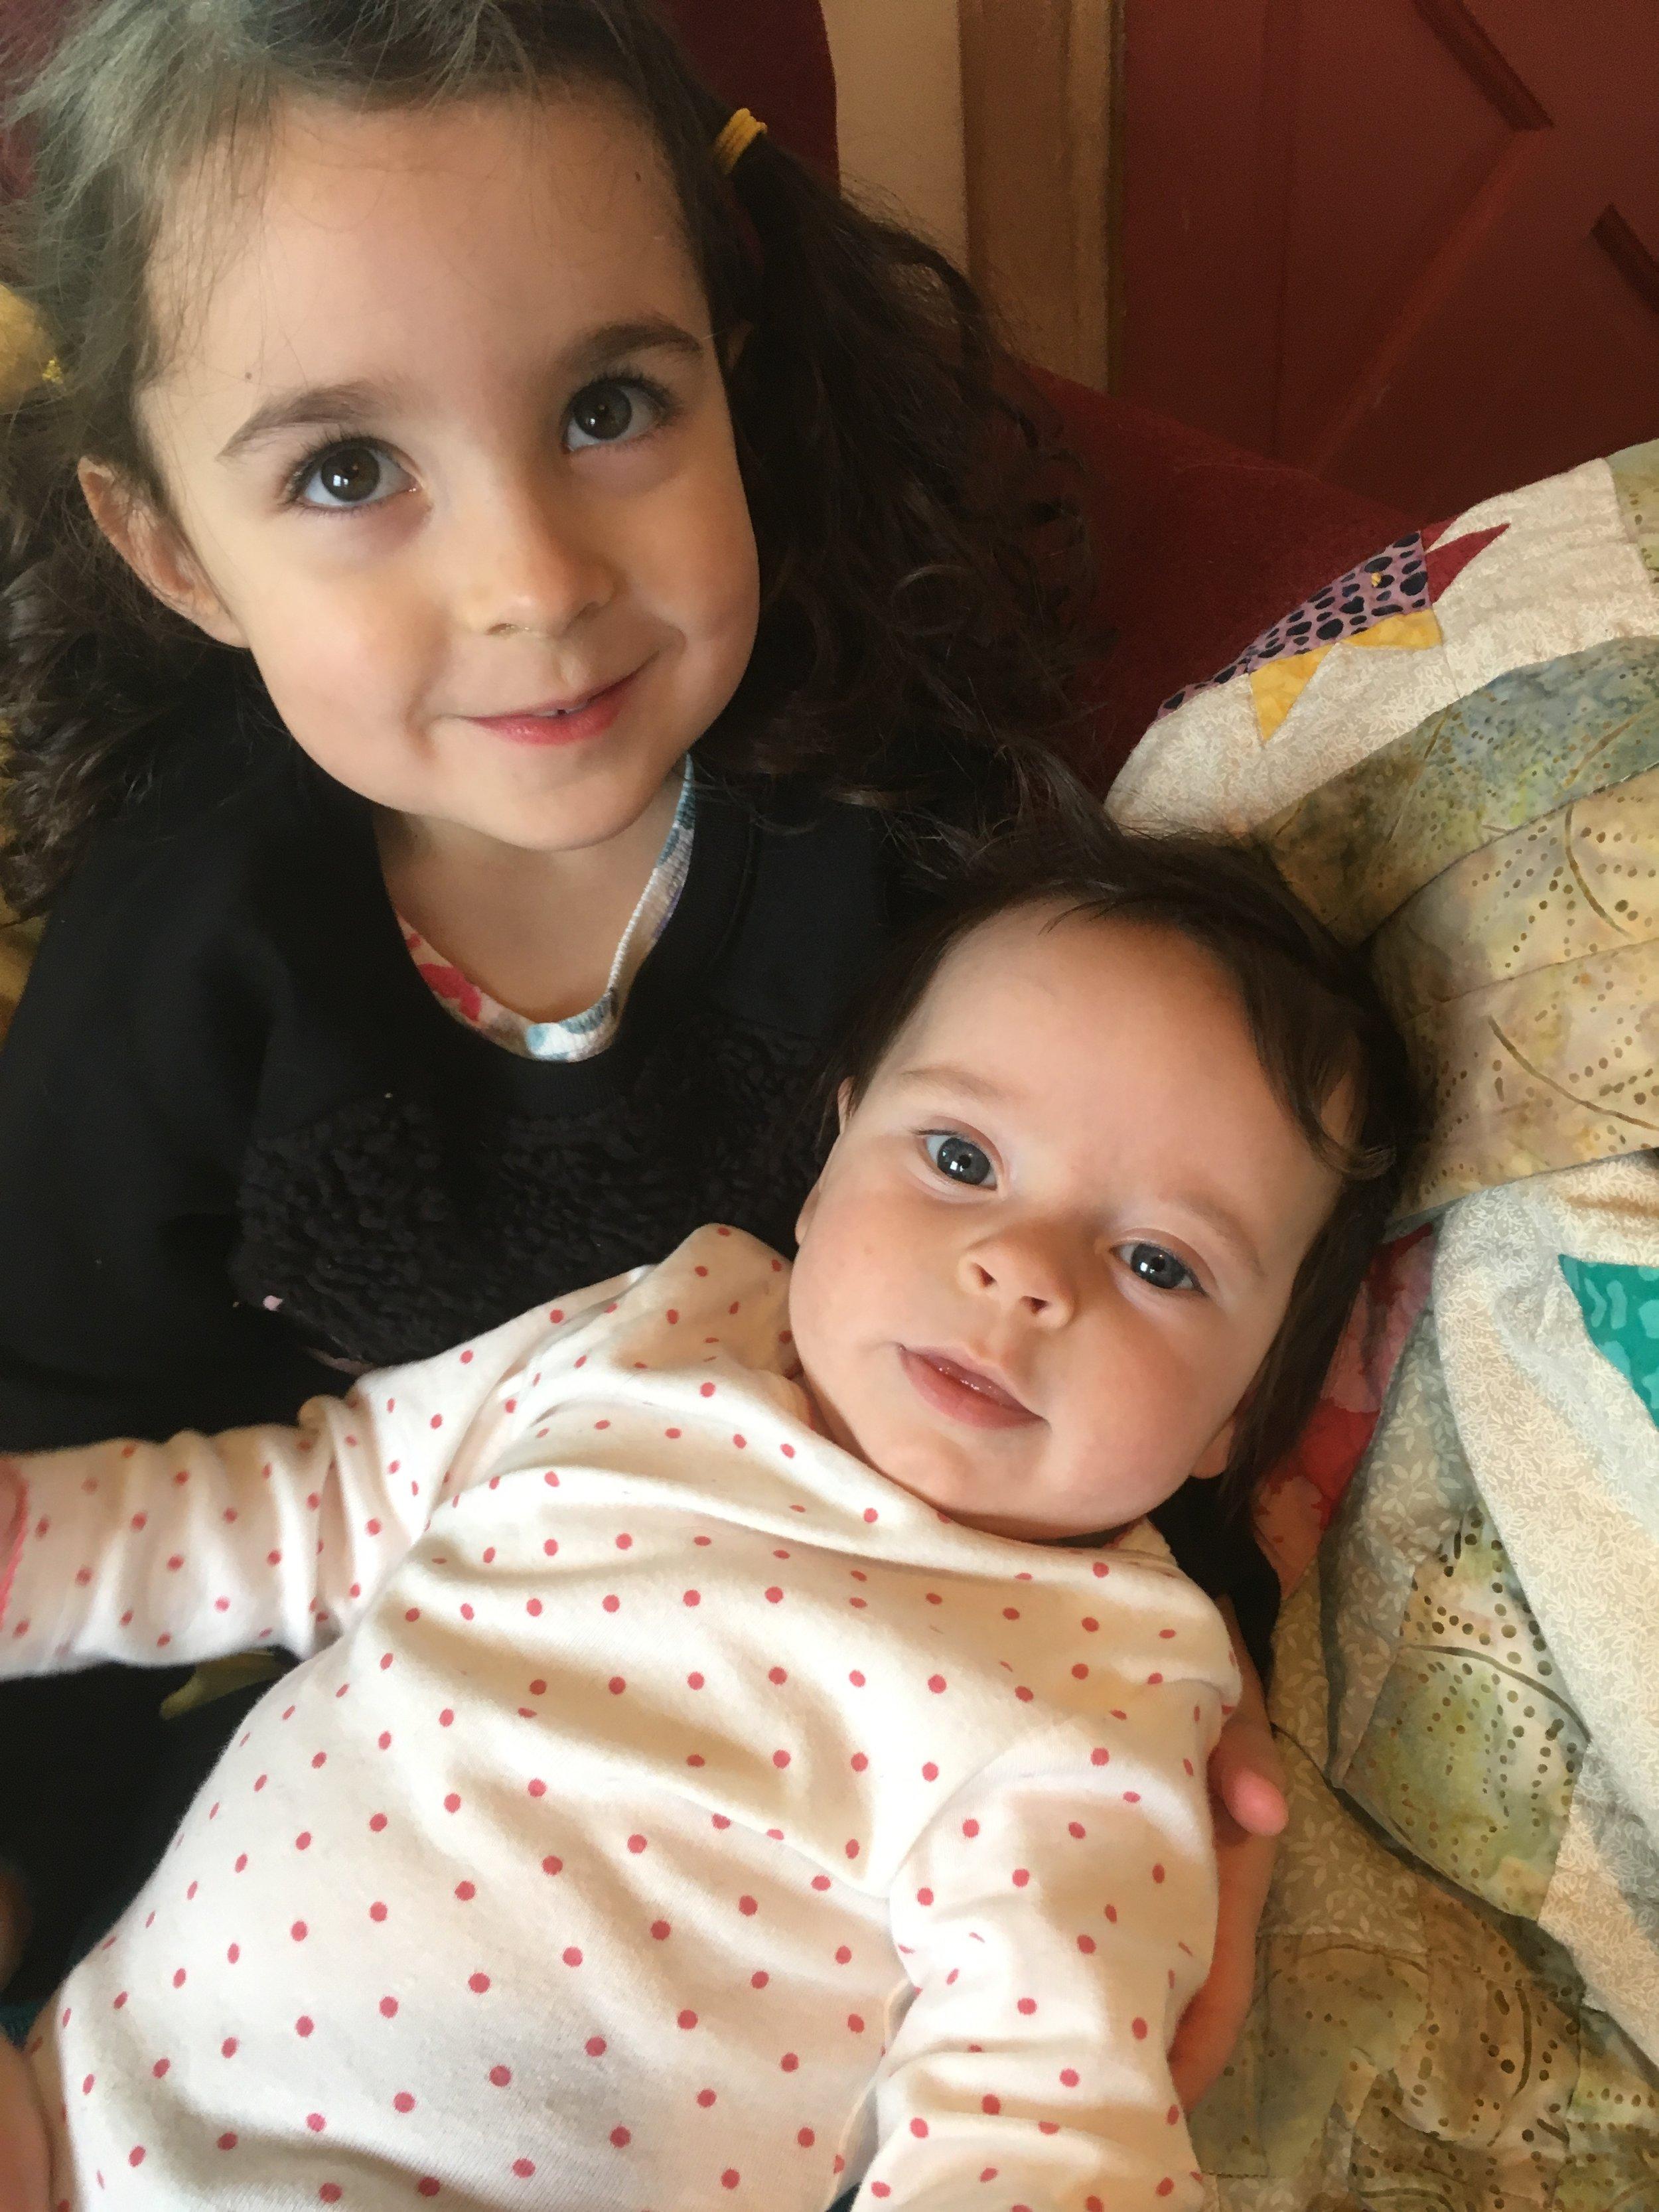 One of Soraya's older cousins, Viola is holding her!